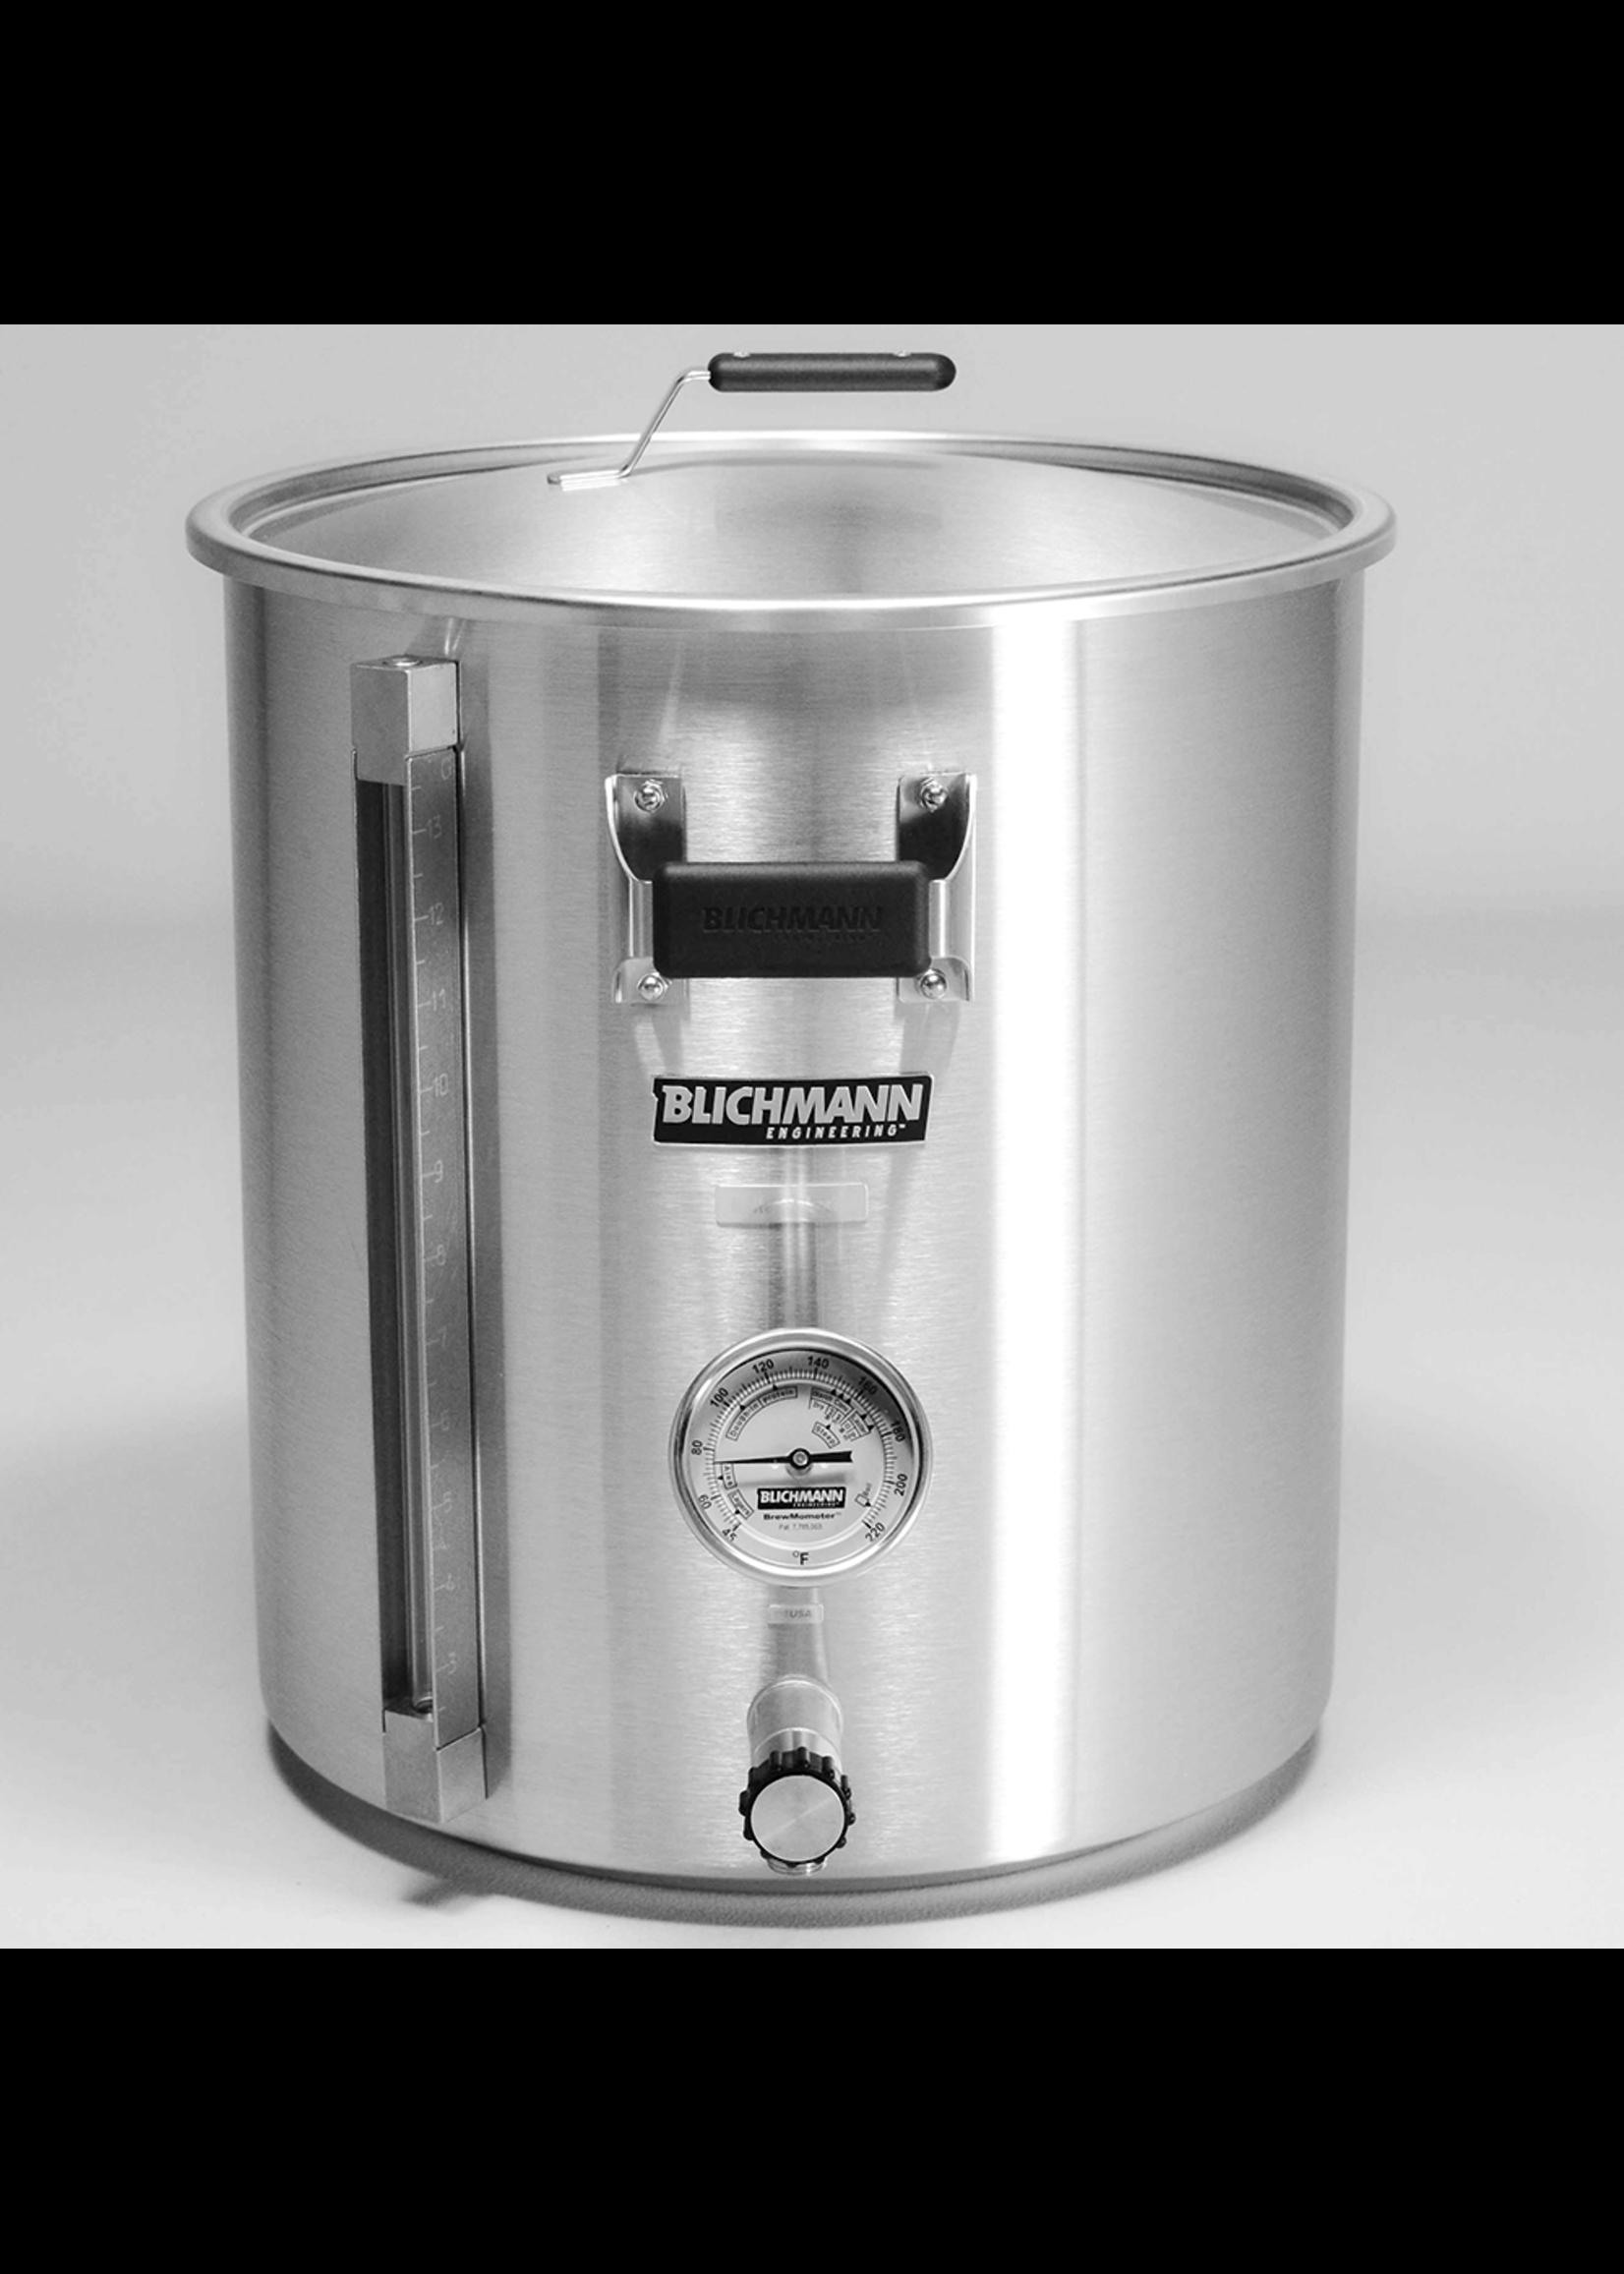 Blichmann Blichmann BoilerMaker G2 - 7.5 Gallon Standard Brew Kettle (Fahrenheit)